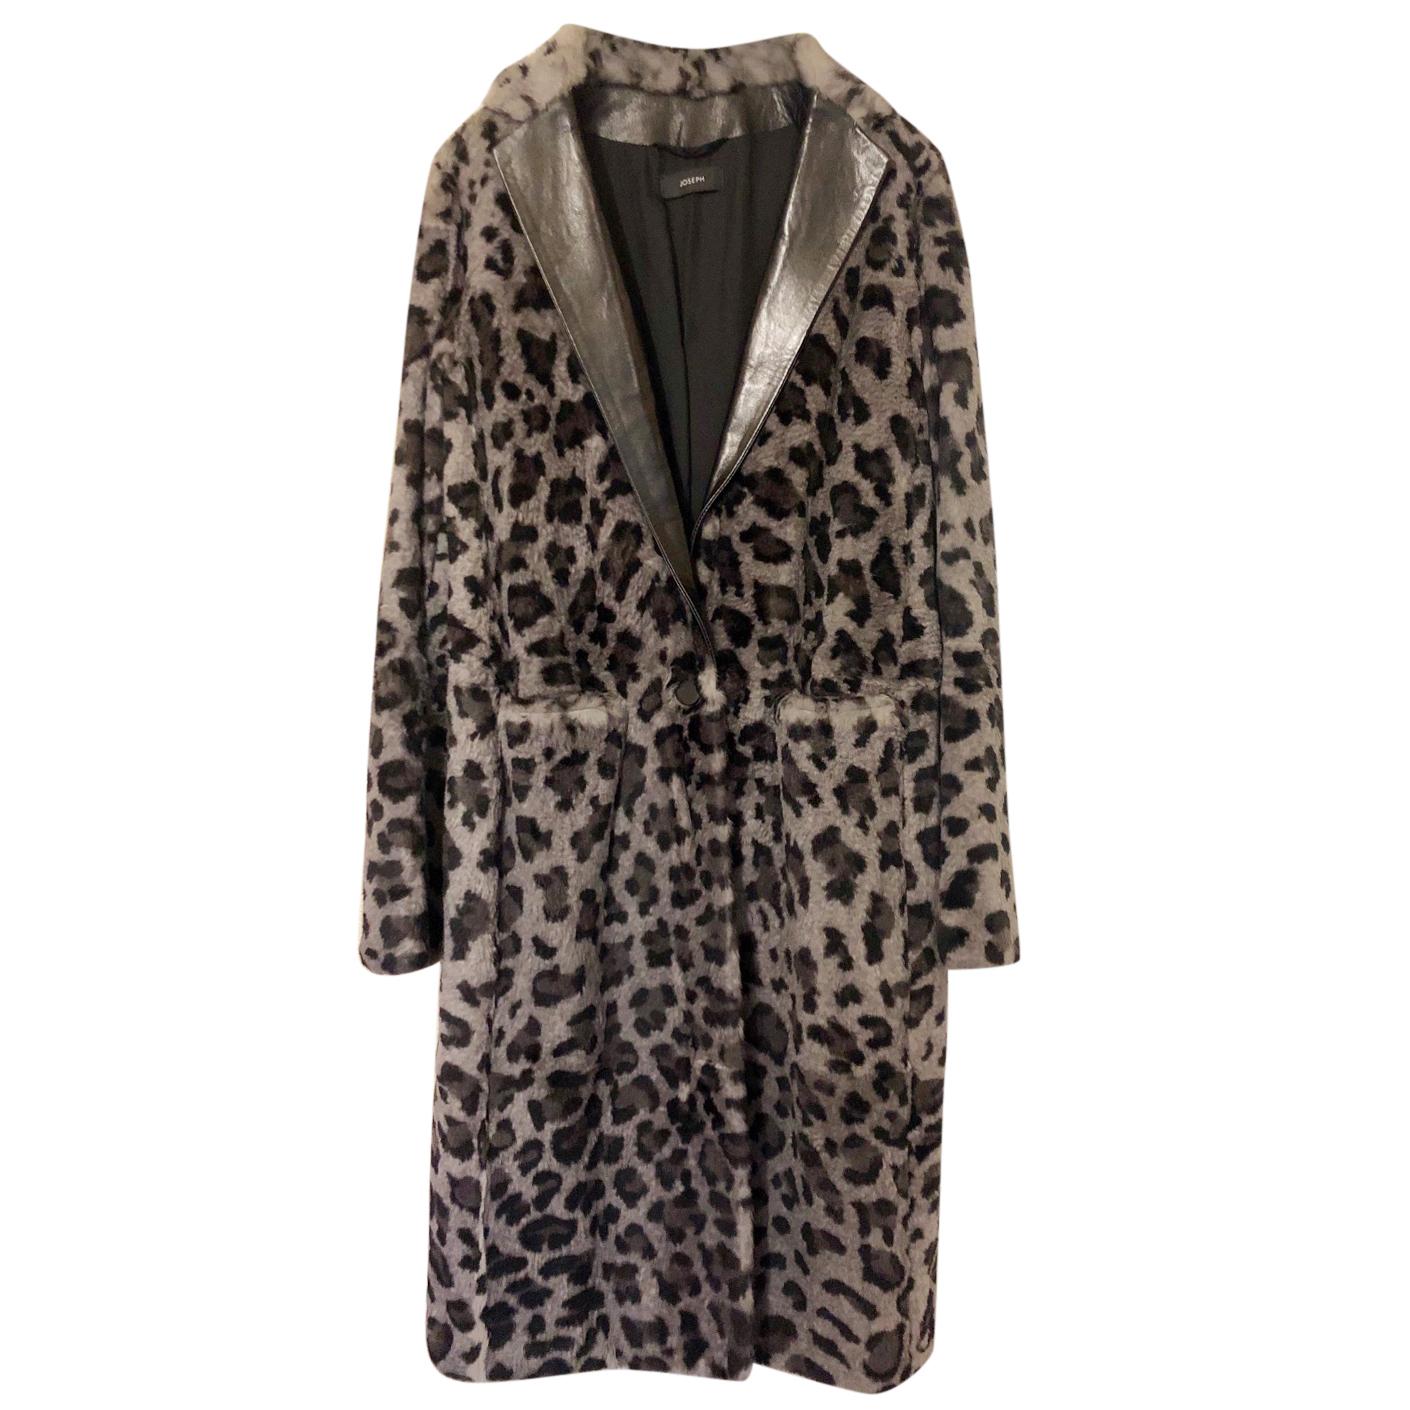 Joseph rabbit fur leopard print coat